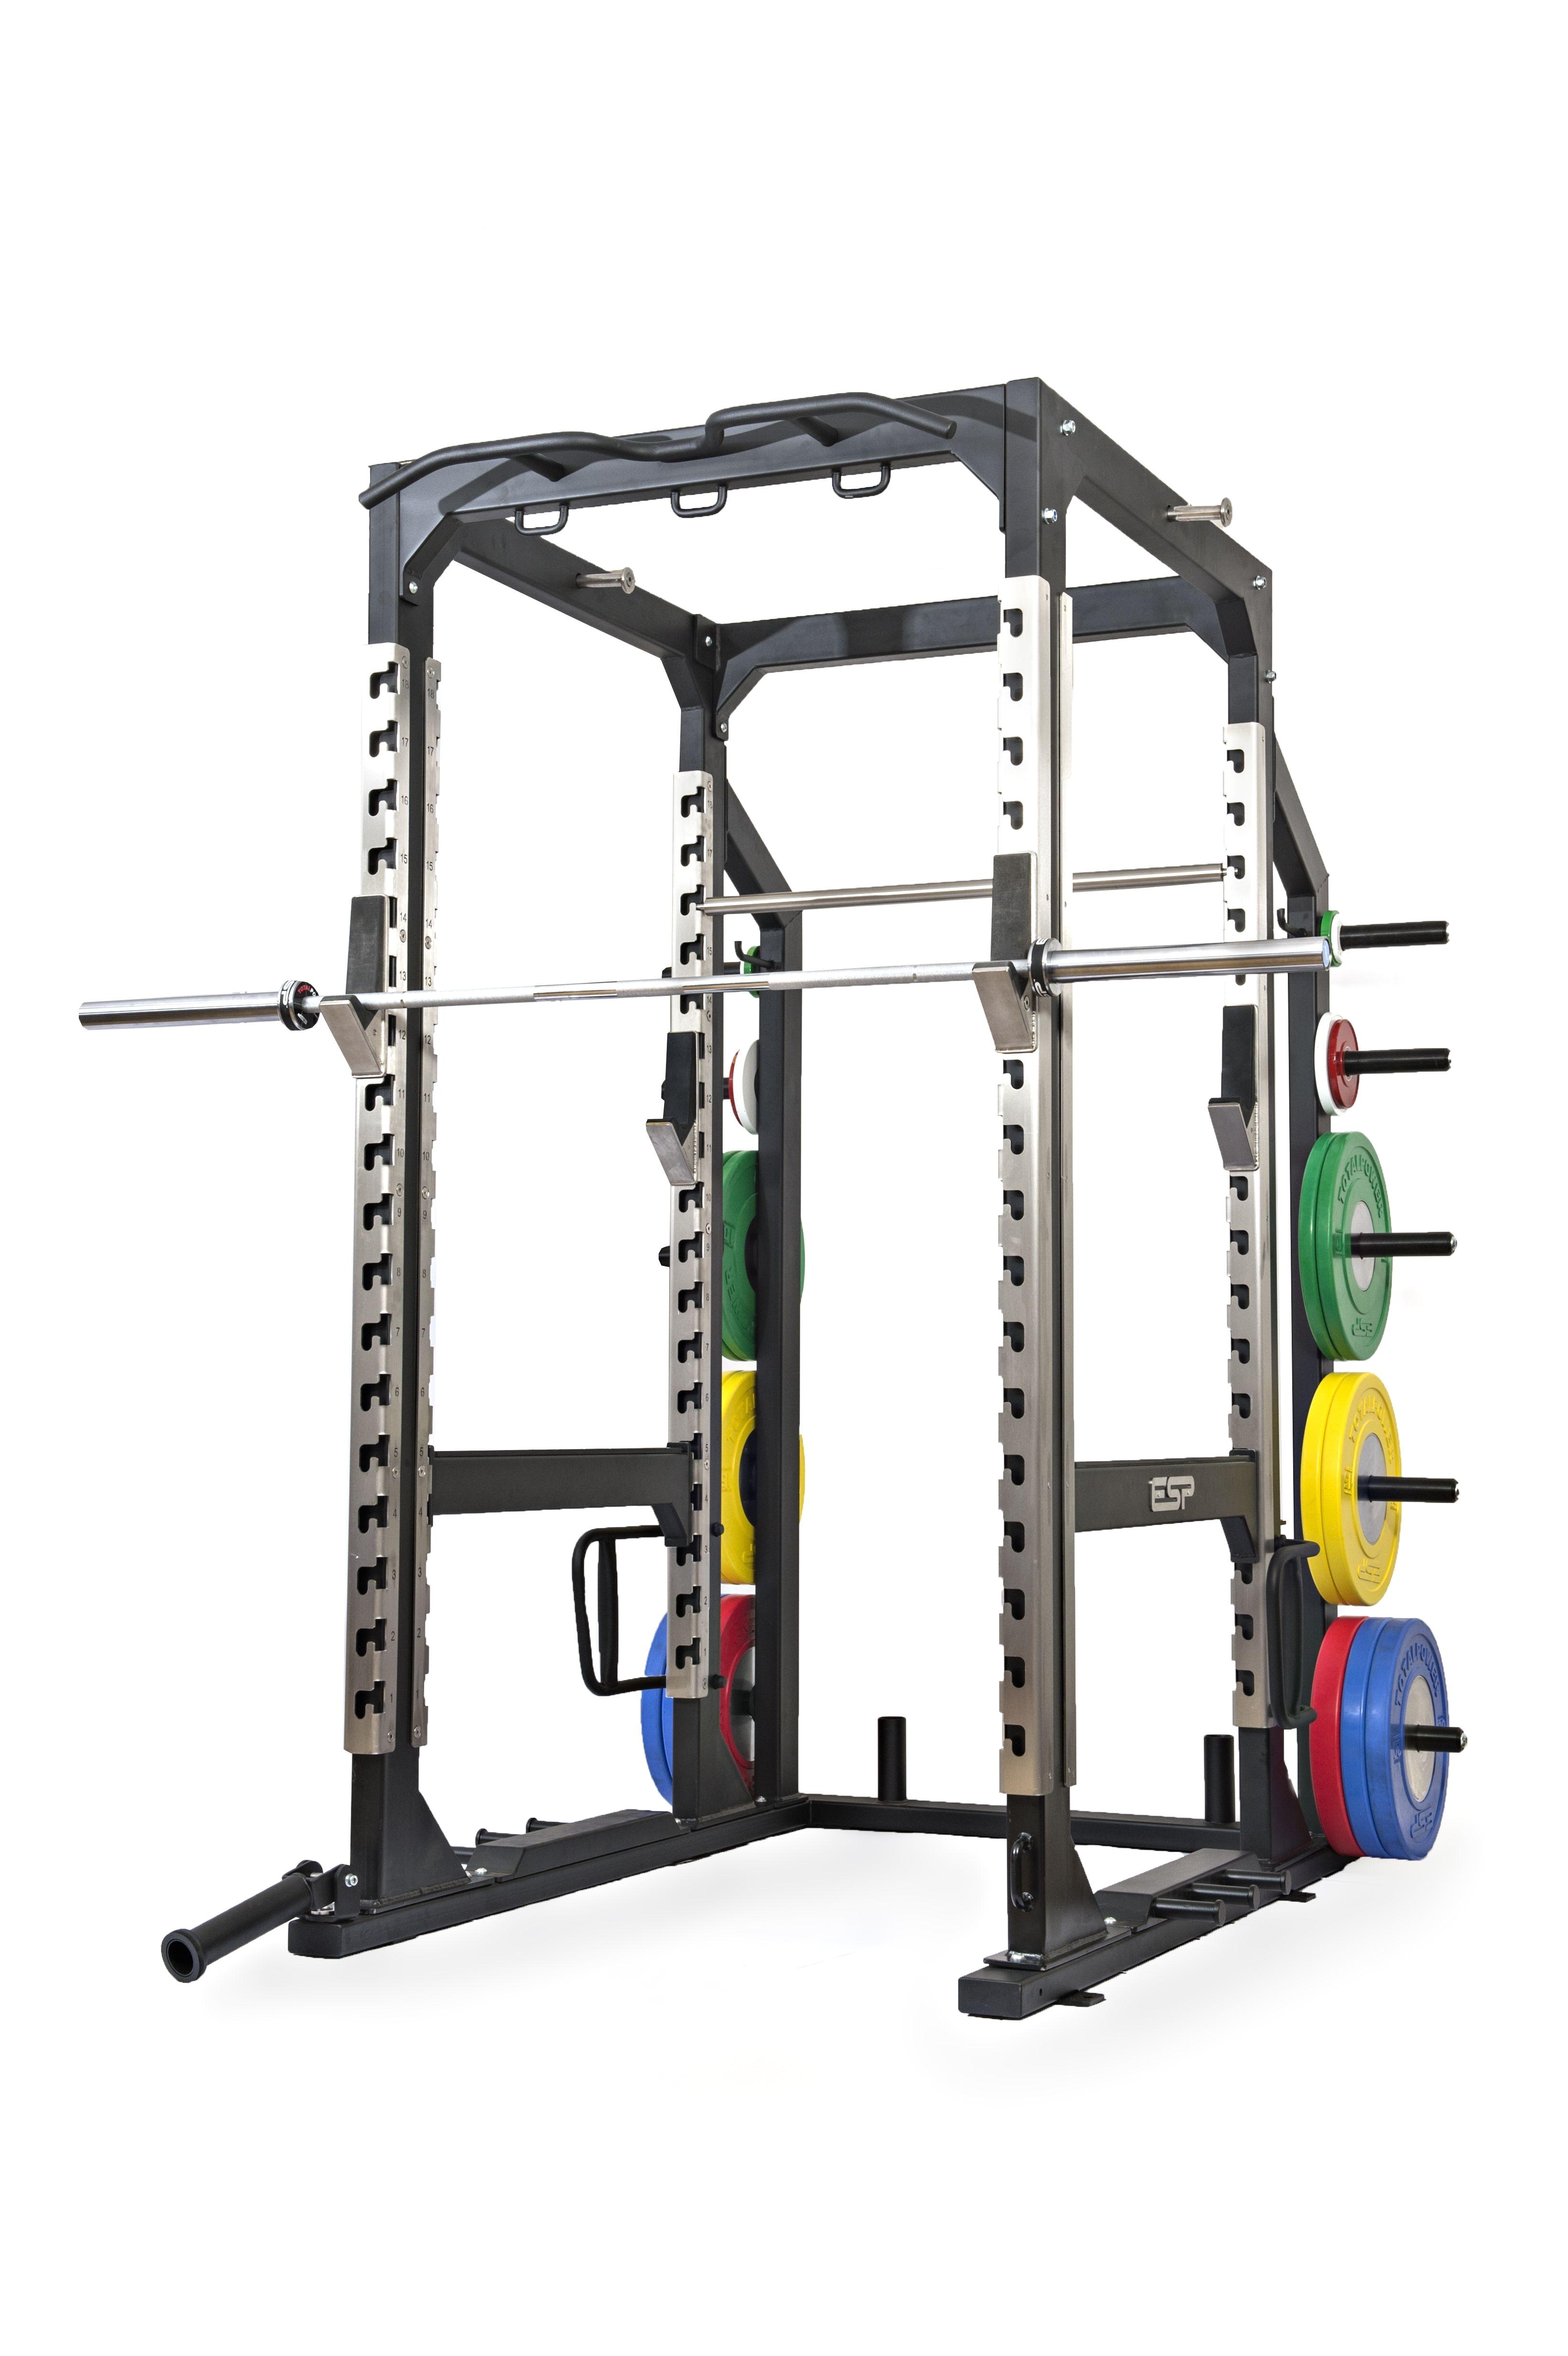 Tuff Stuff Squat Rack Esp Power Rack Pro totalpower Pinterest Power Rack Gym and Gym